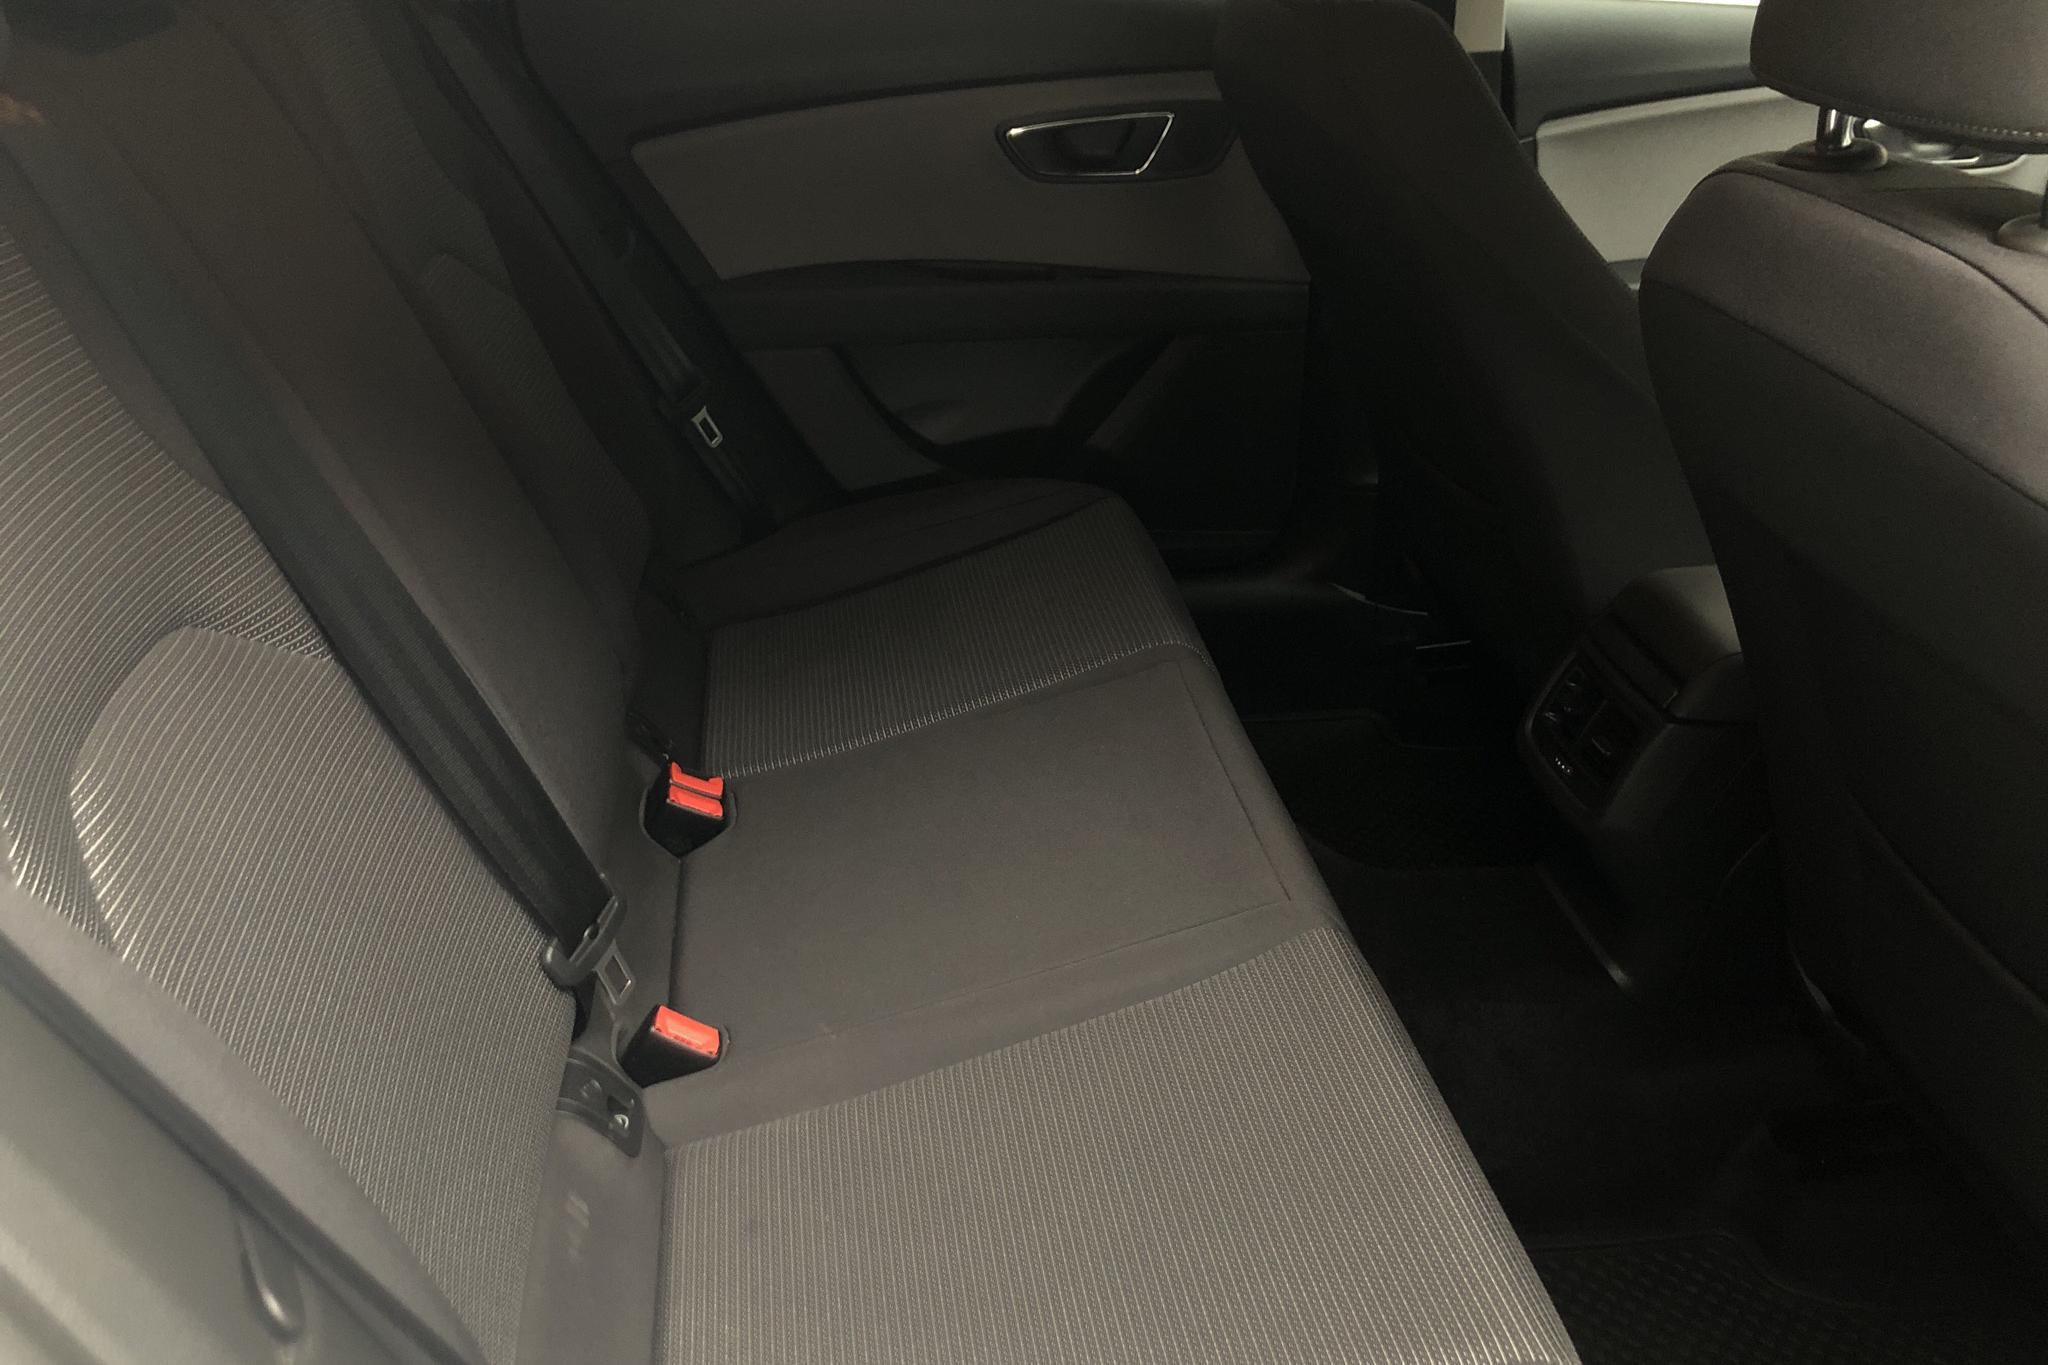 Seat Leon 1.2 TSI 5dr (110hk) - 5 715 mil - Manuell - vit - 2018